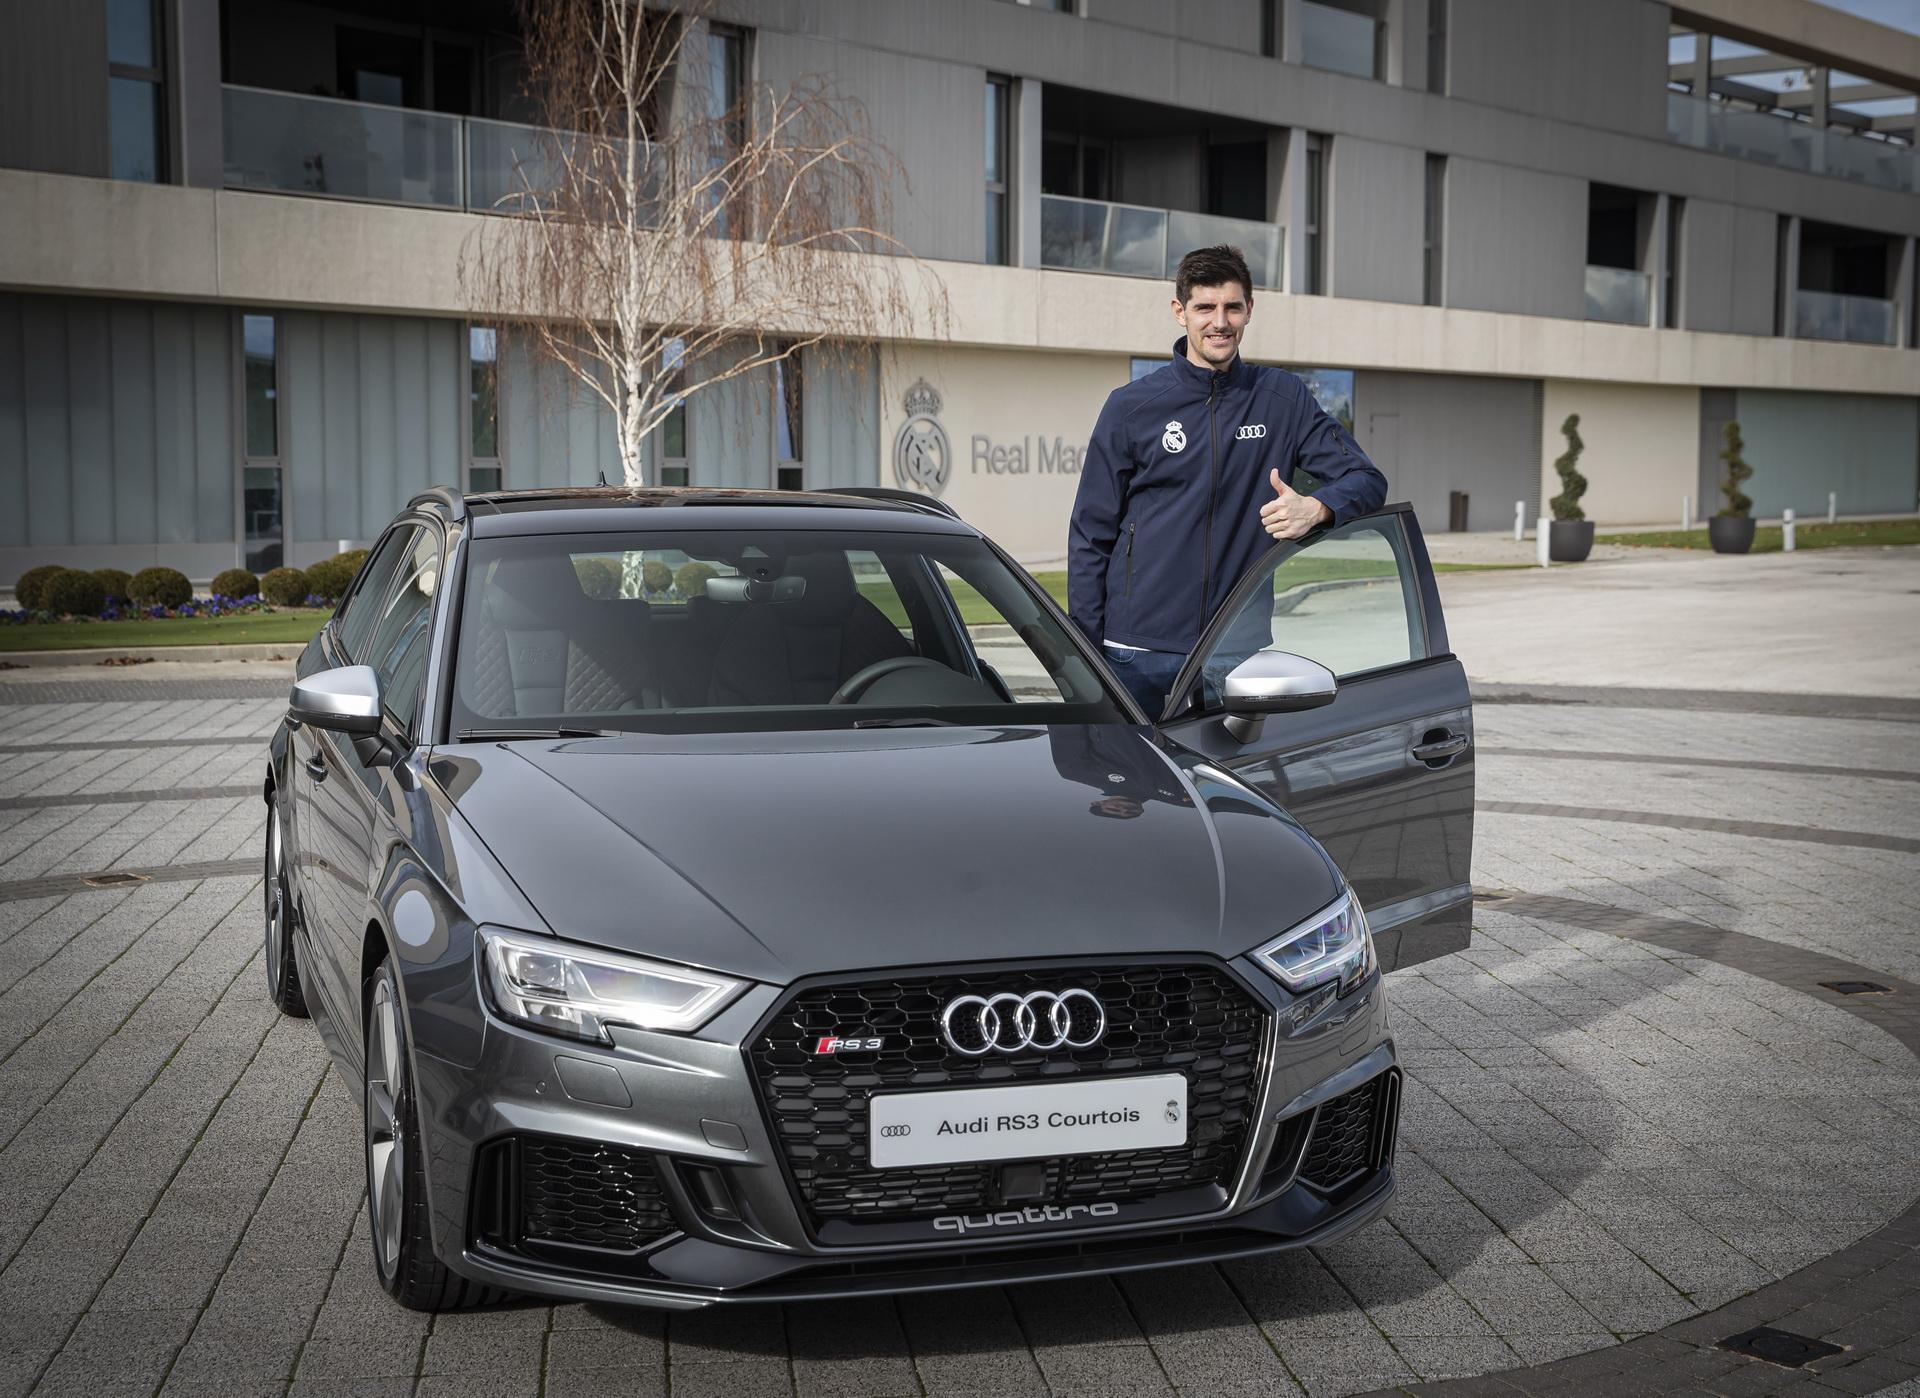 Real_Madrid_Players_Audi_0001